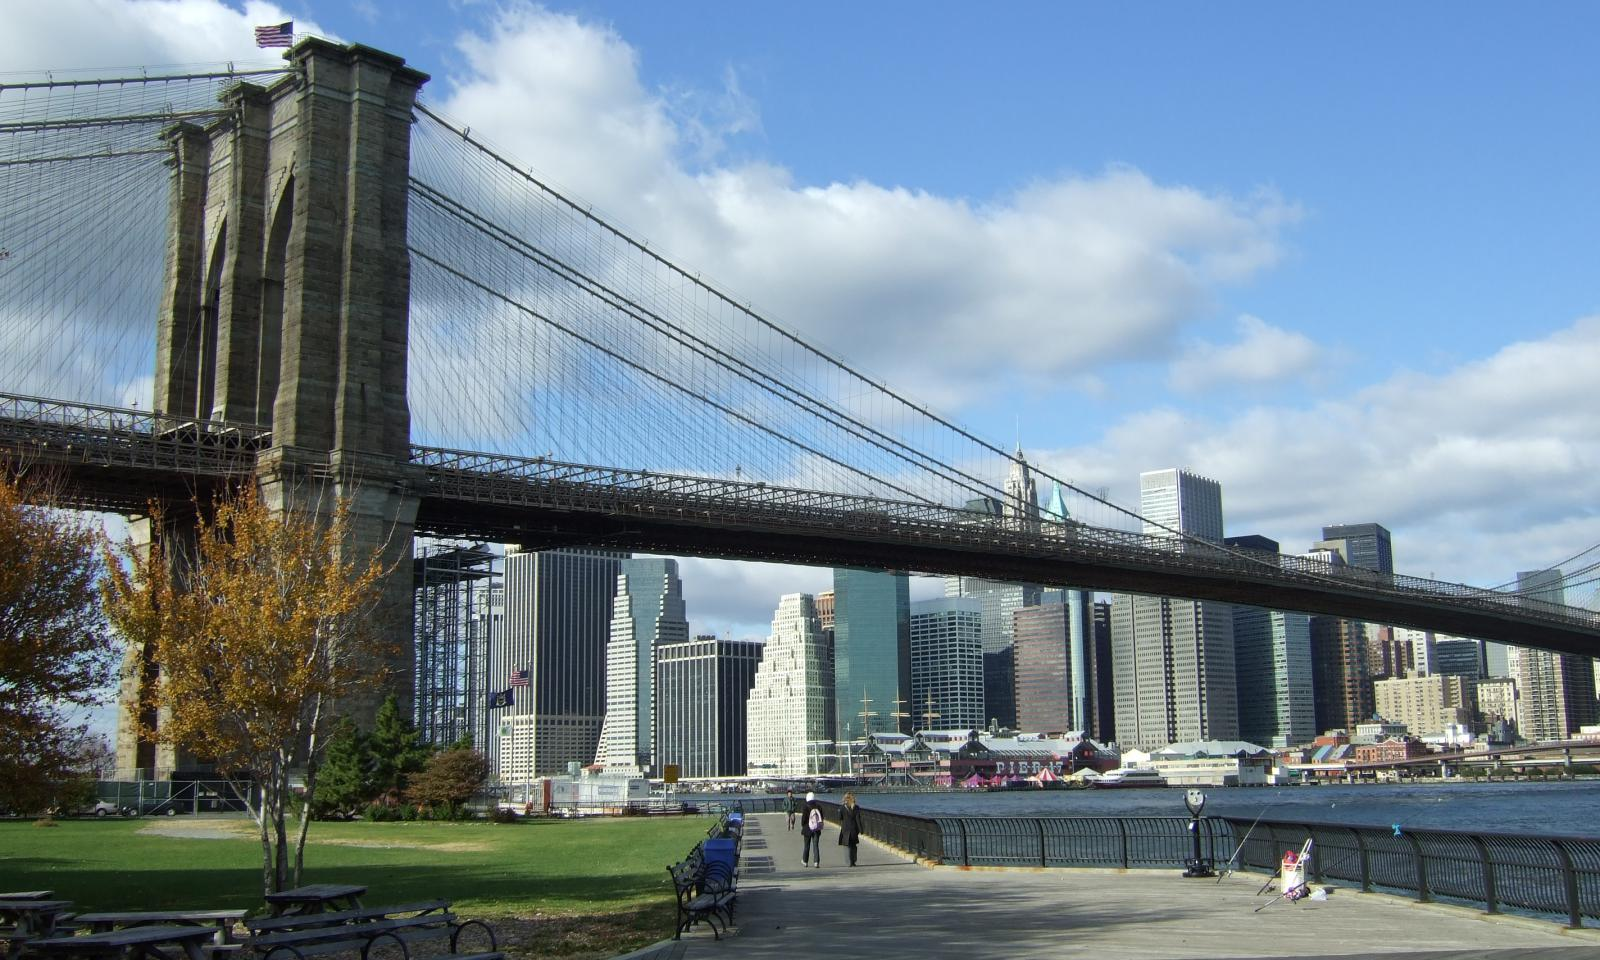 Brooklyn Bridge Park Foto: Rudy Norff / Flickr CC